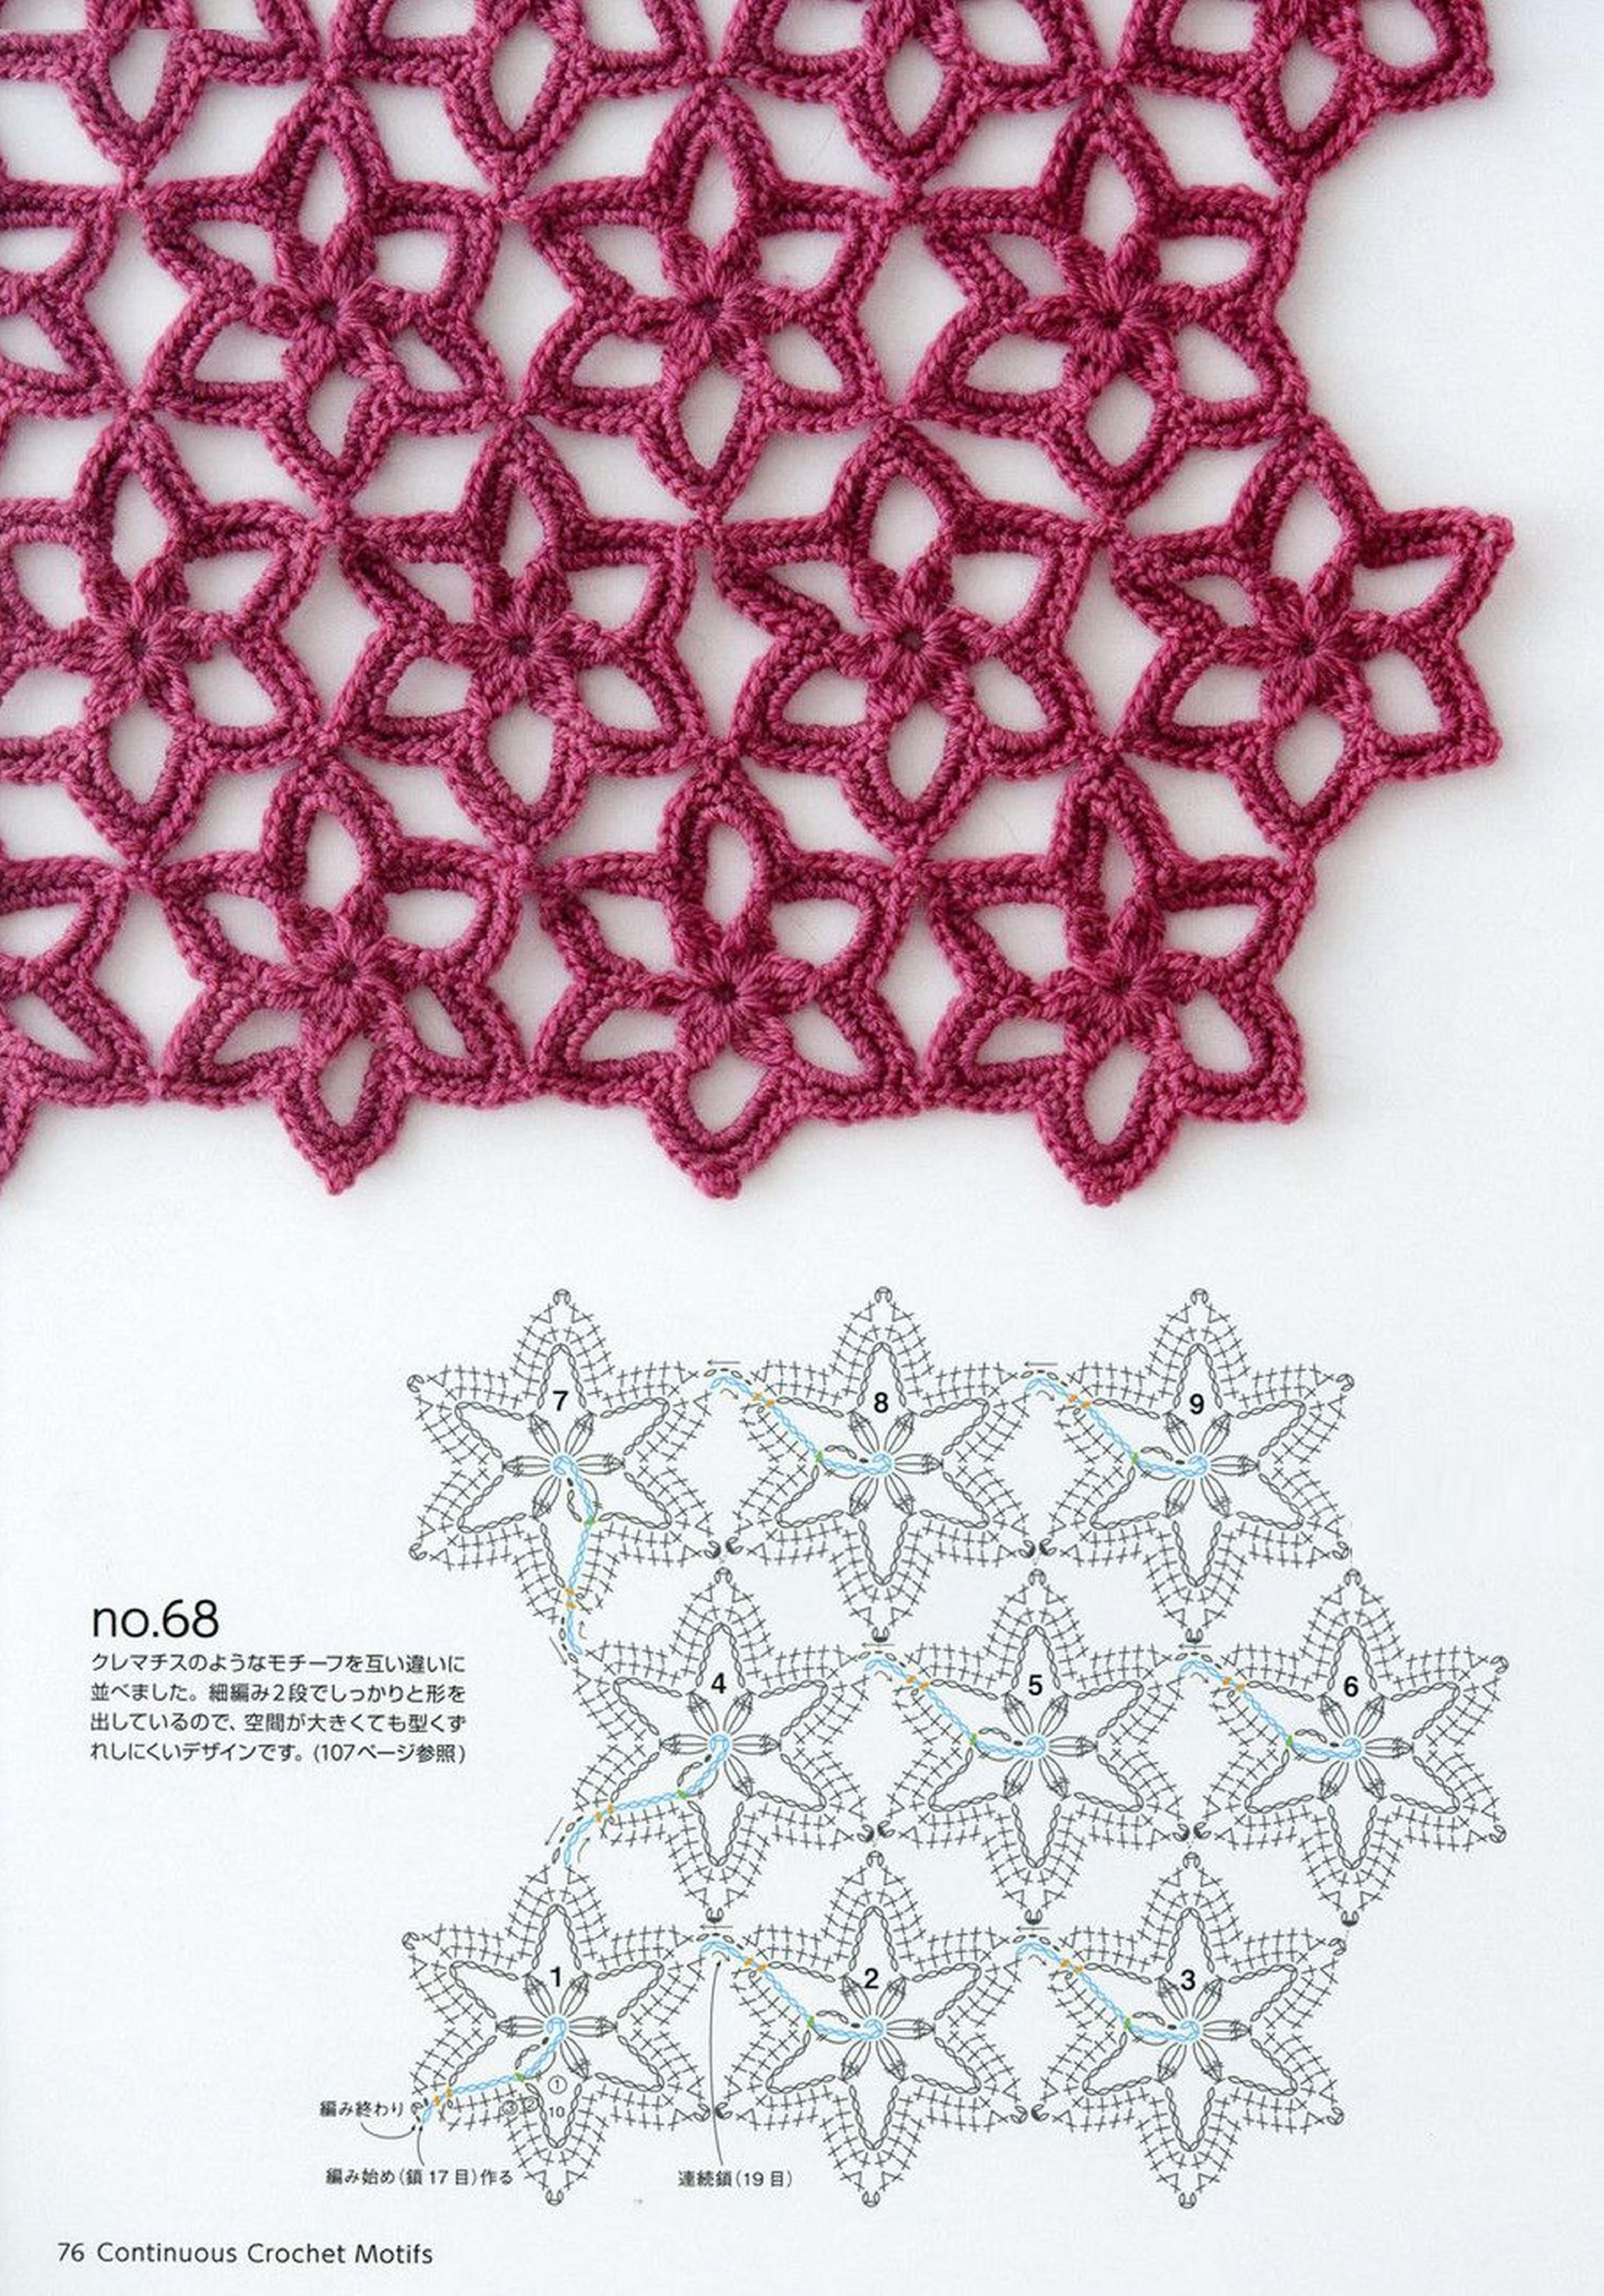 Безотрывное вязание Альбом | CHALESS | Pinterest | Croché, Ganchillo ...